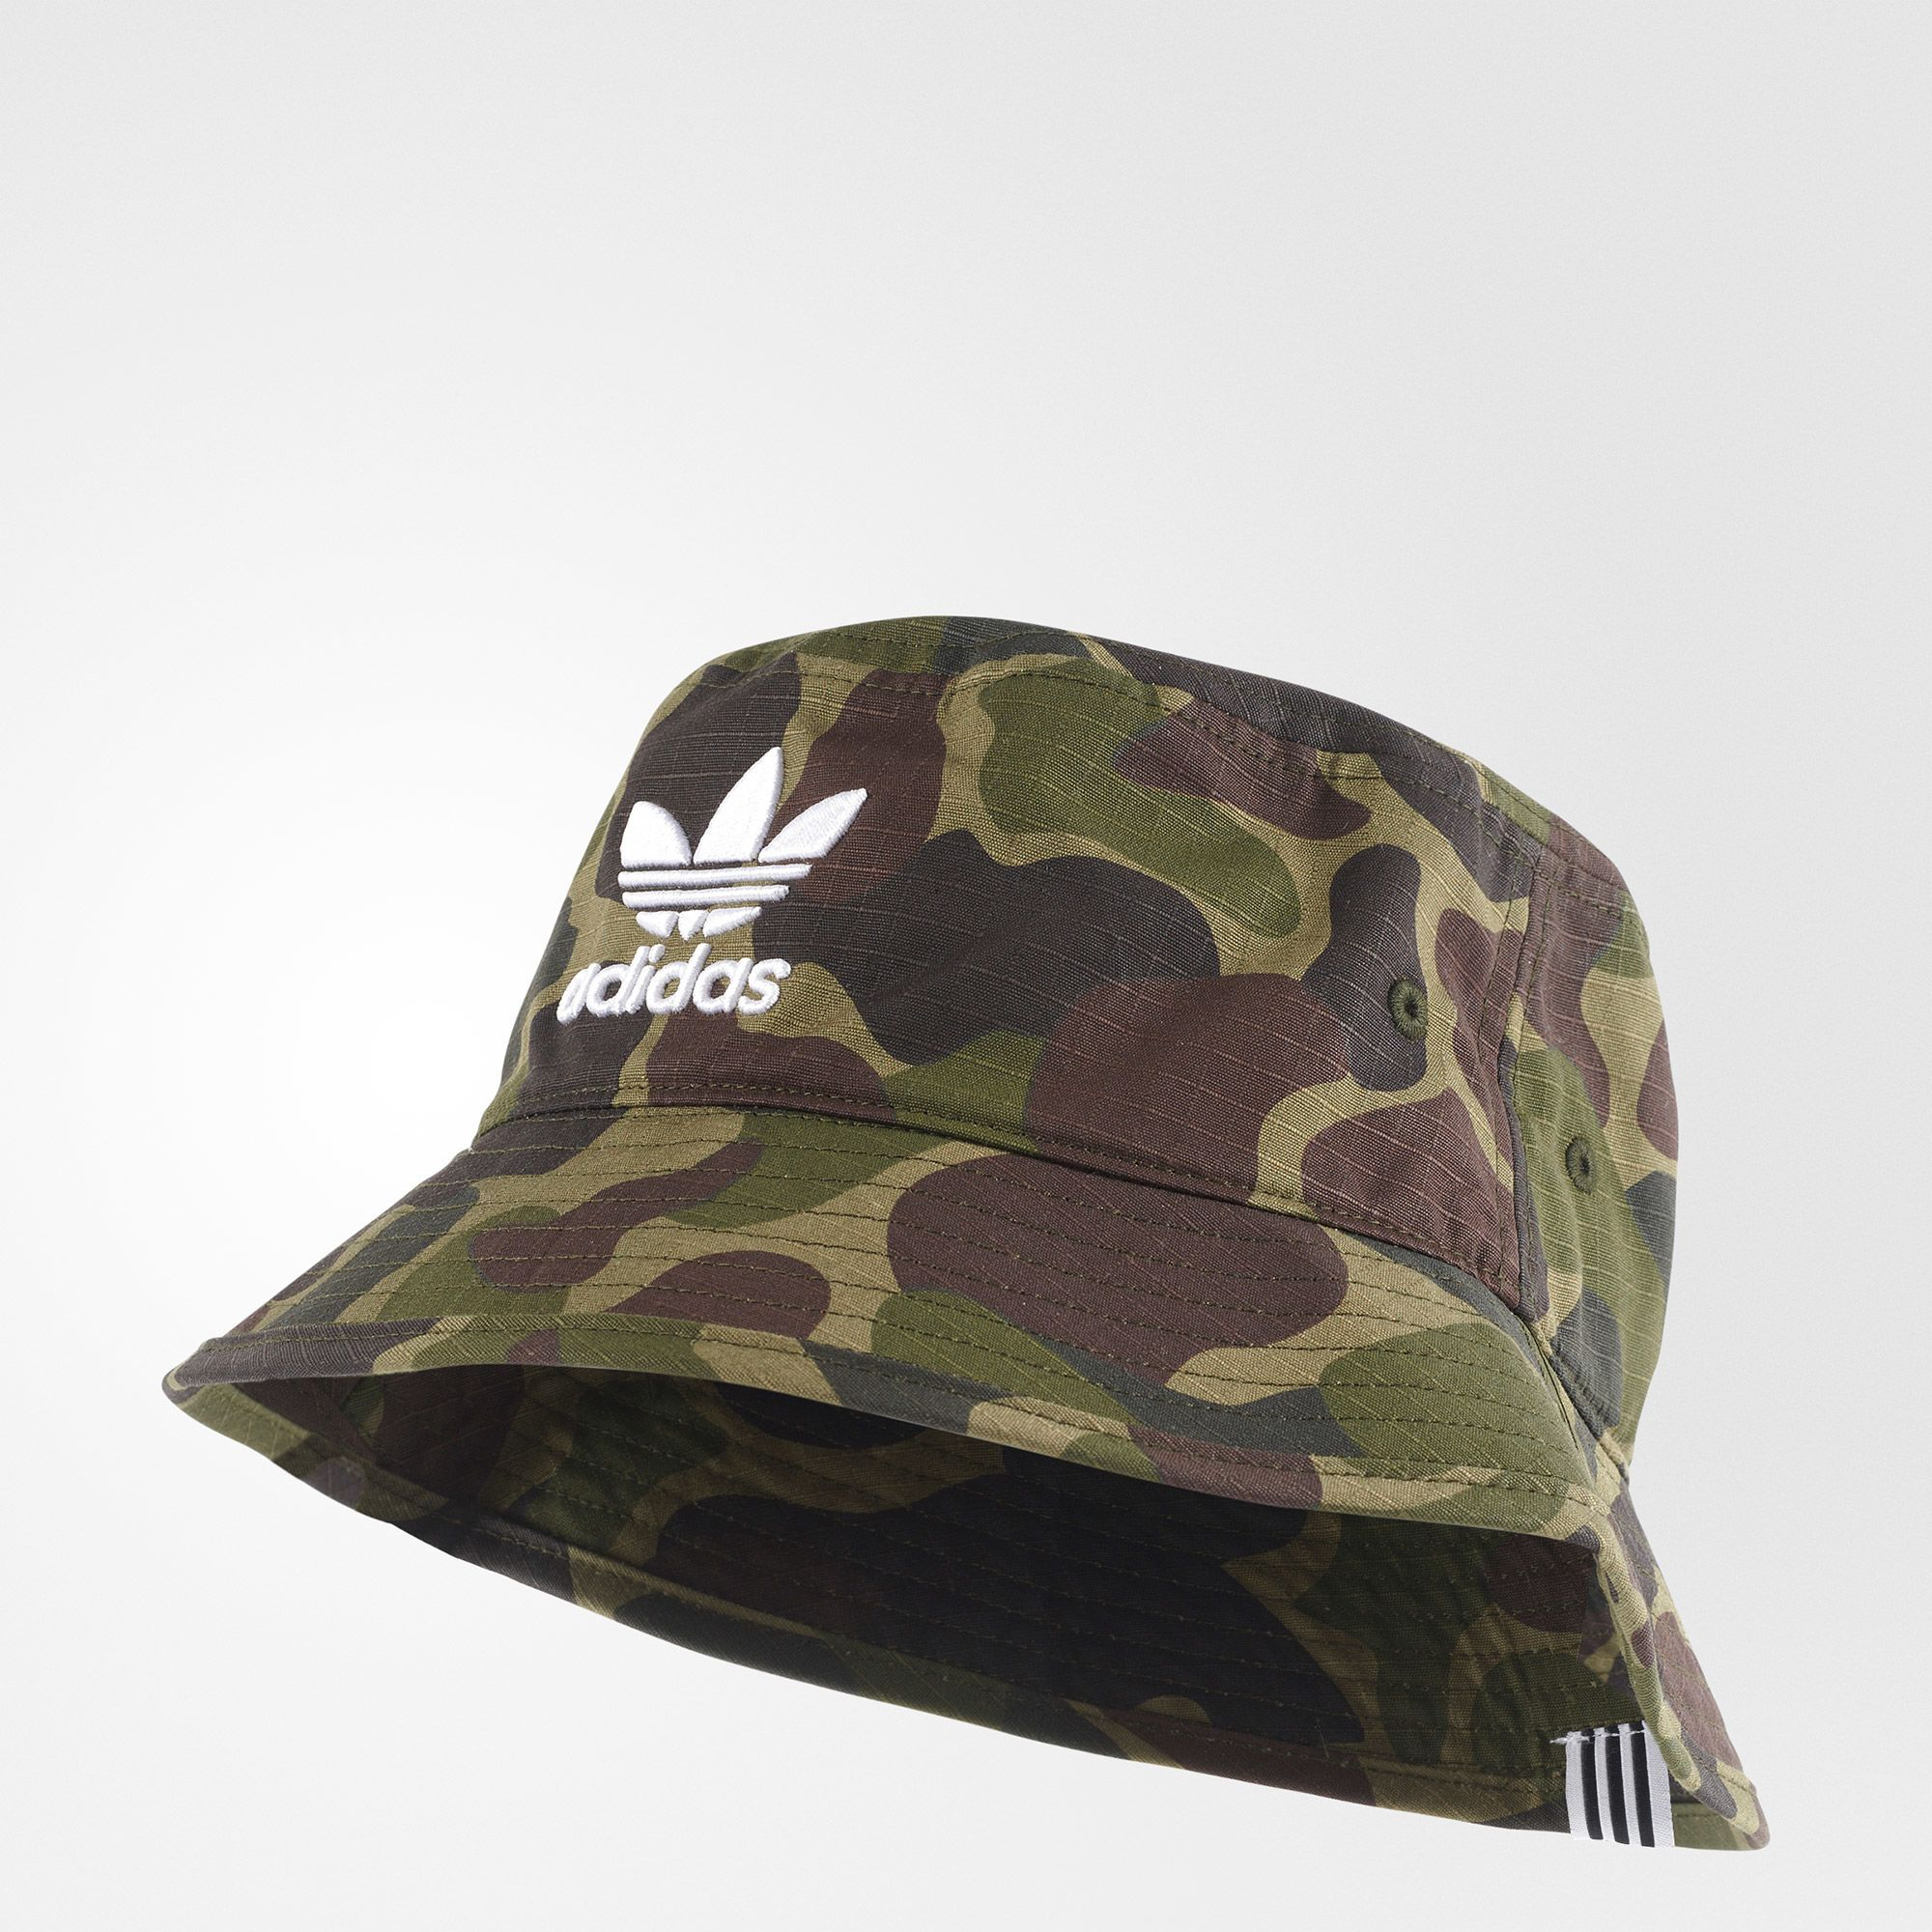 Adidas Chapeu Bucket Camo Cal 231 Ados Adidas Pinterest